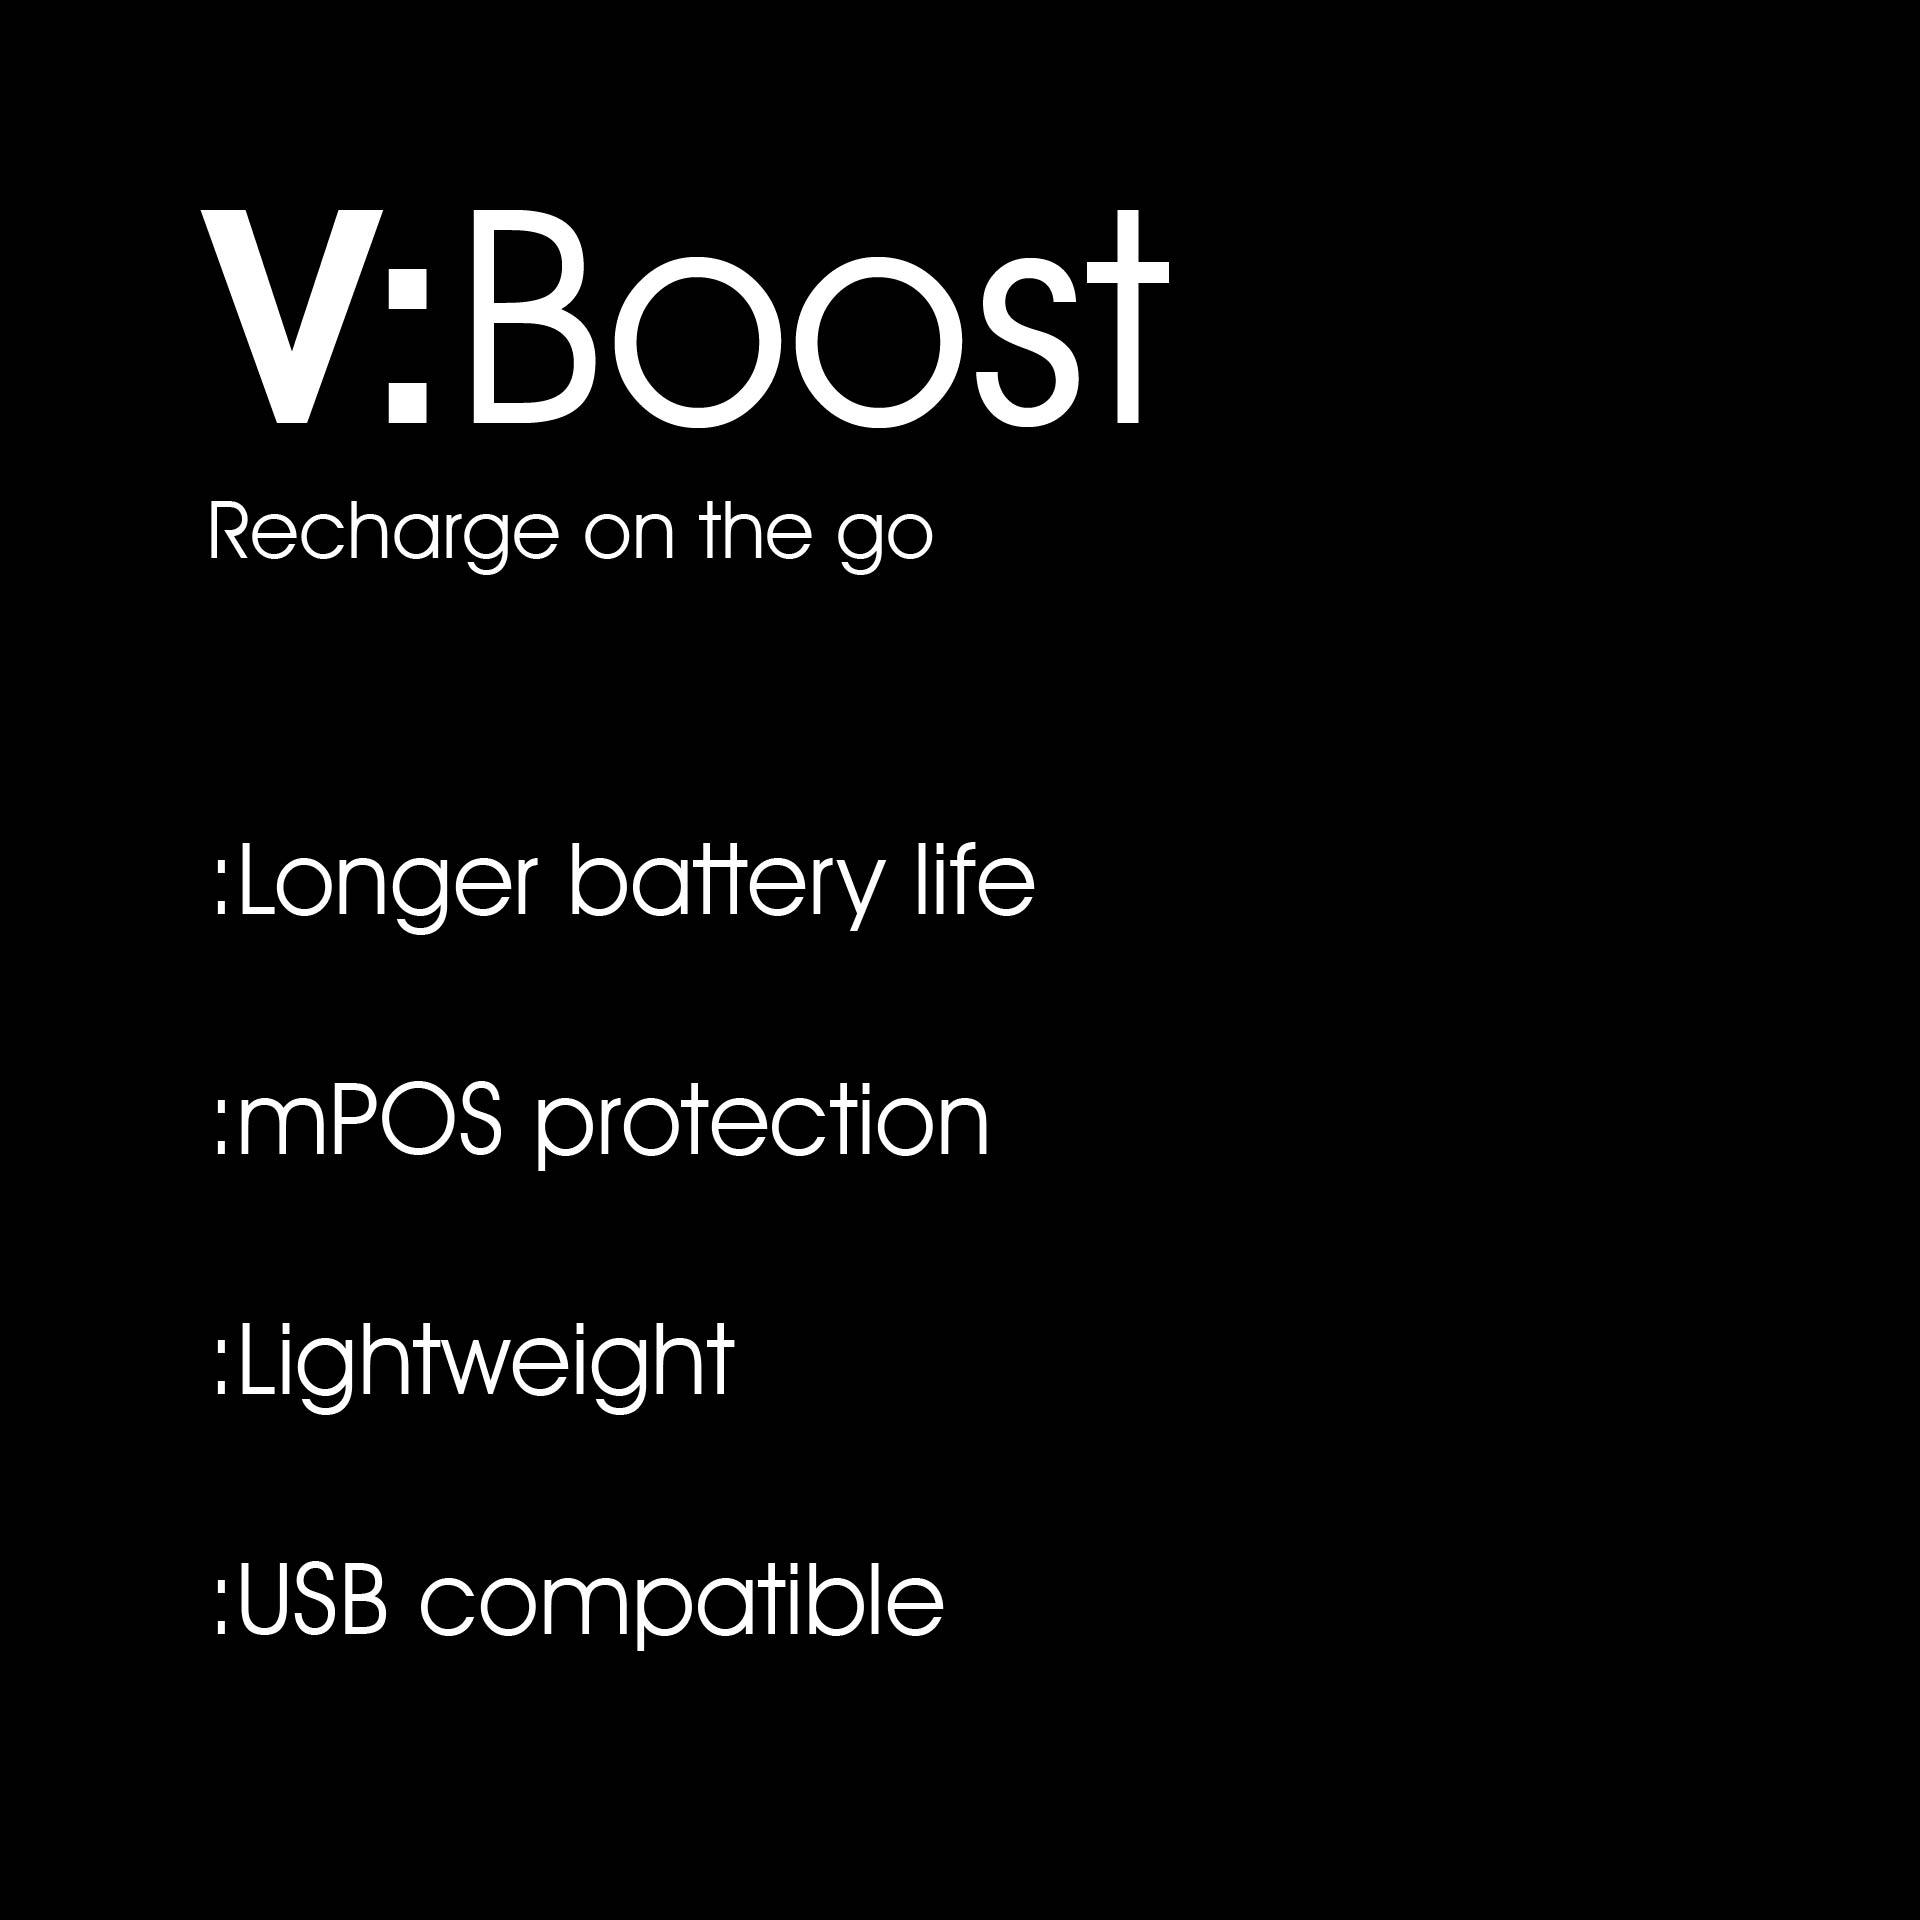 vboost miura m020 features-01.jpg